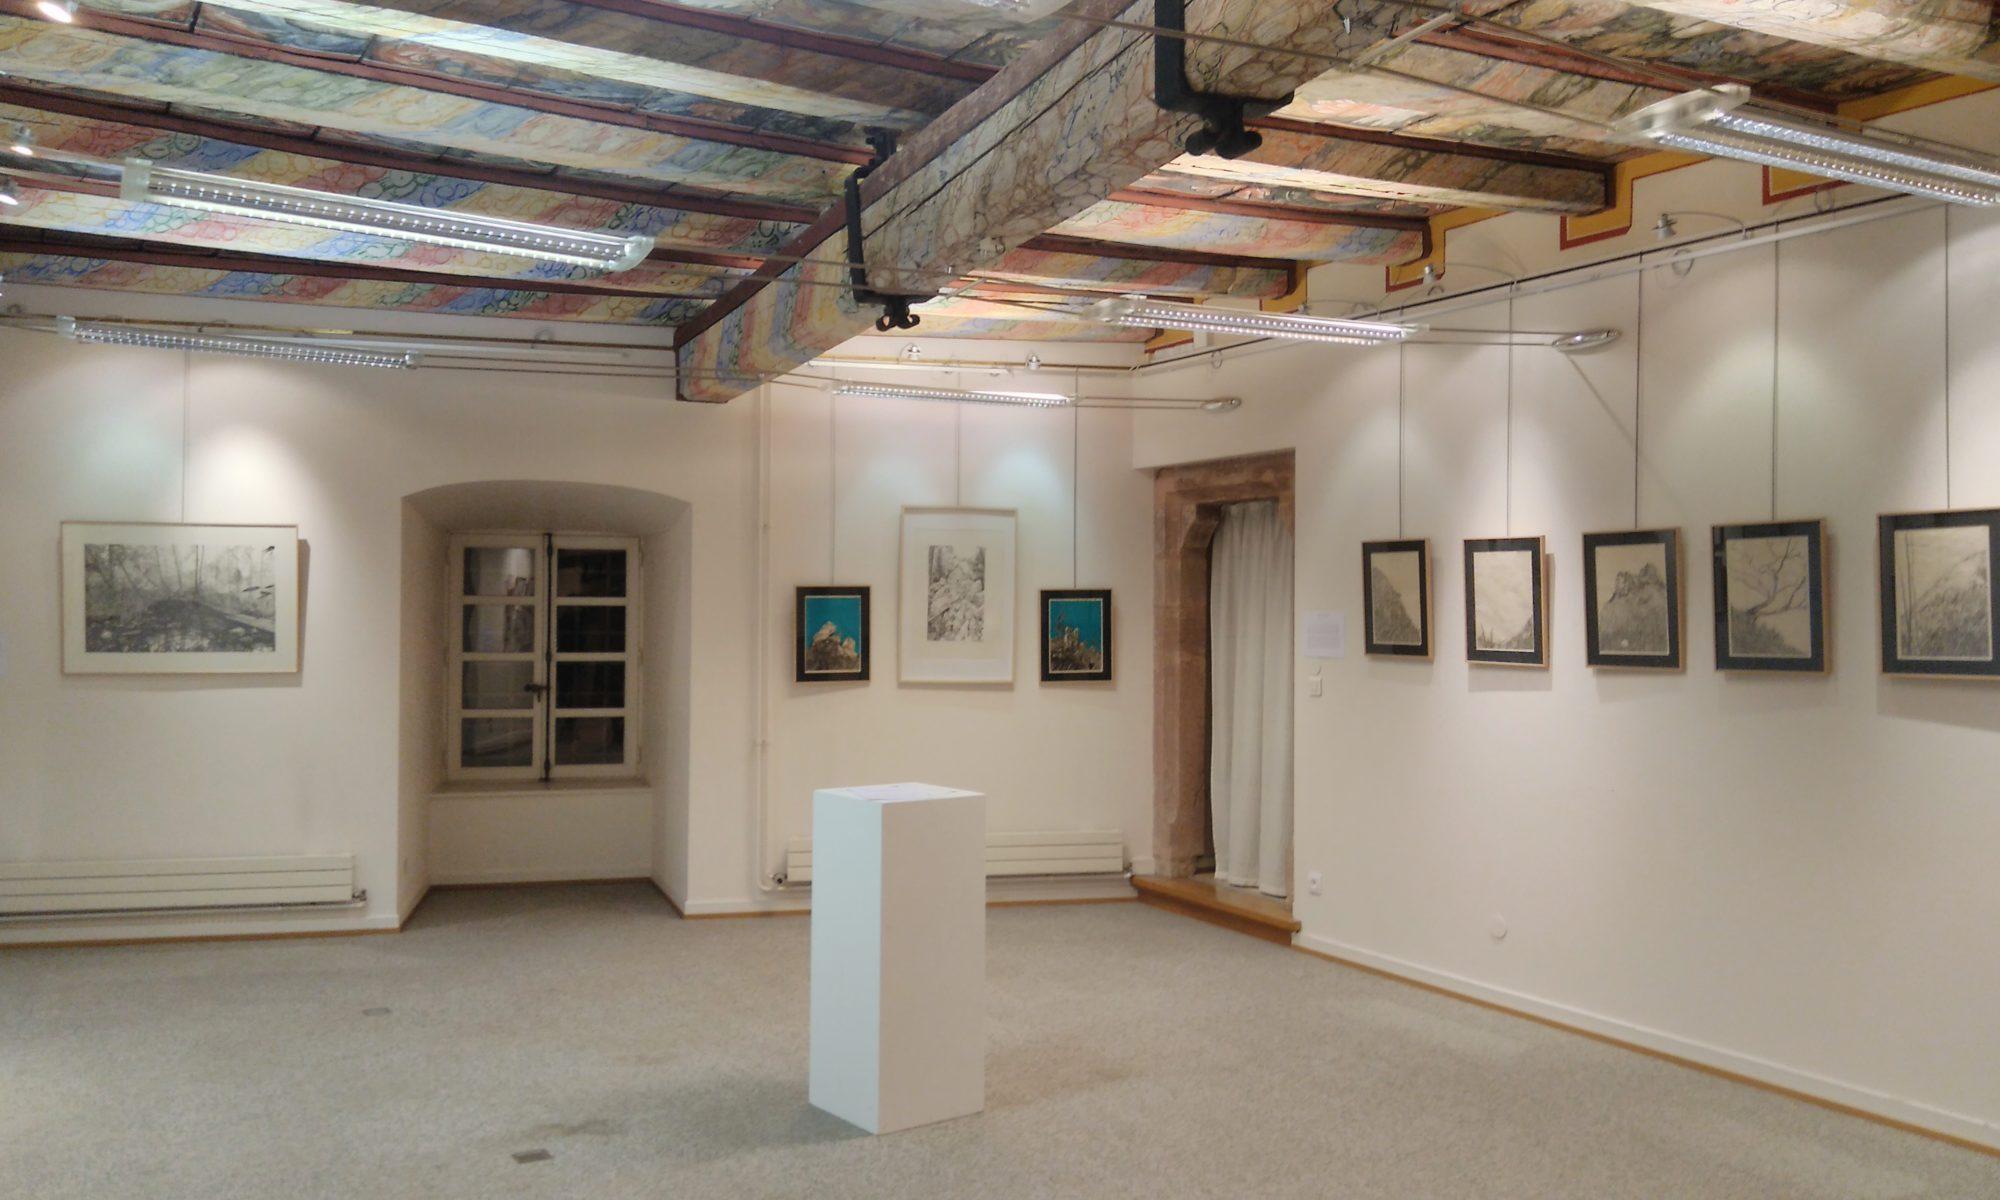 Emmanuel Henninger, Mulhouse, Art, Kunst